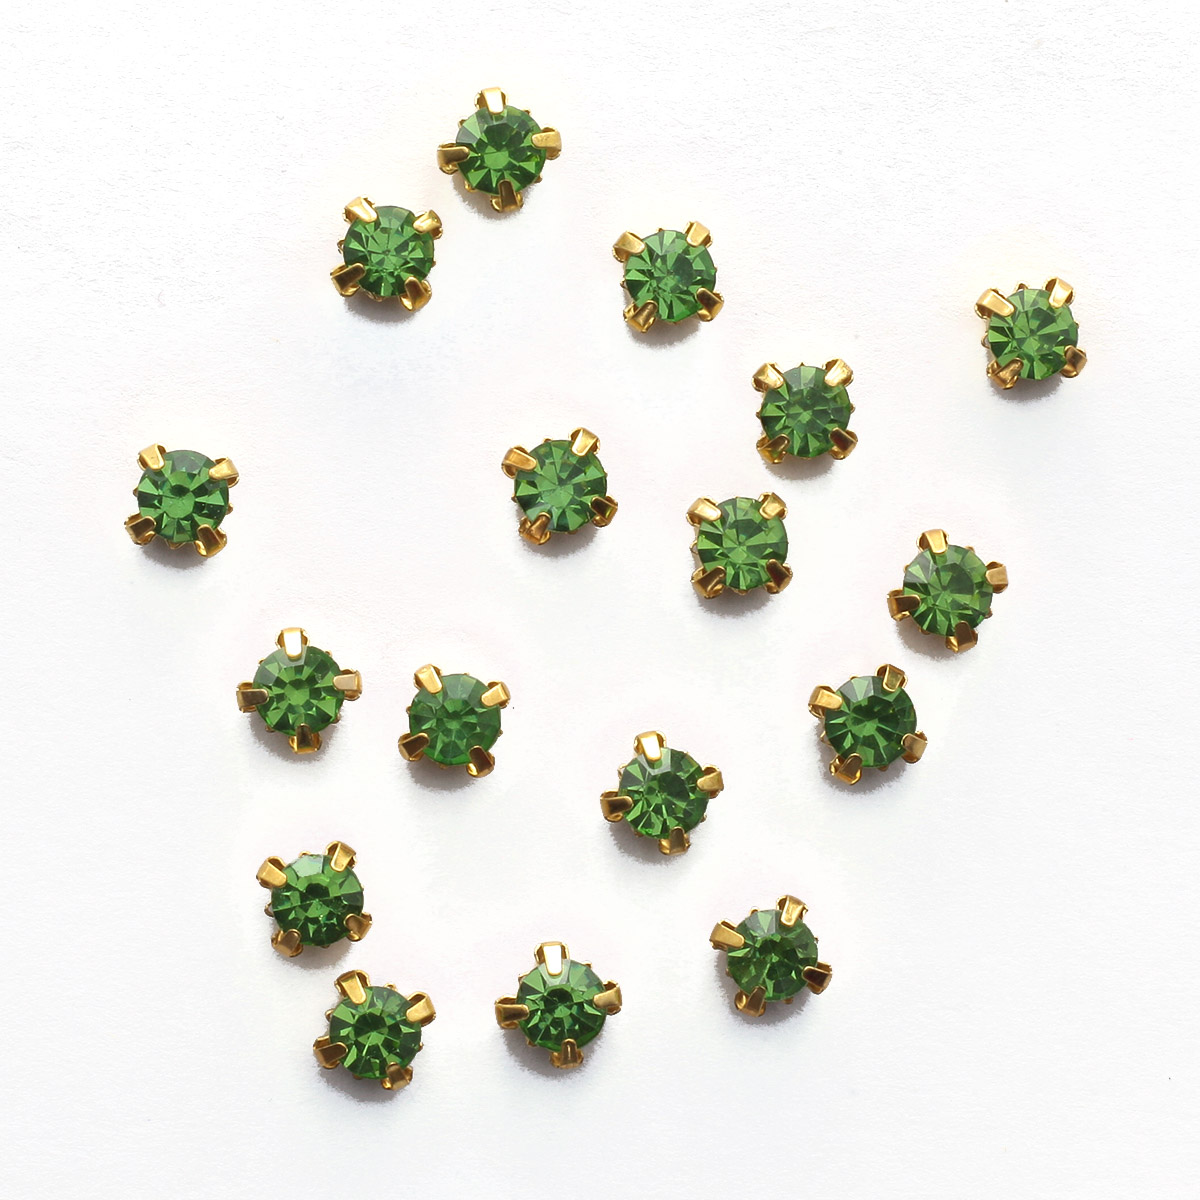 ЗЦ015НН66 Хрустальные стразы в цапах круглые (золото) зеленый 6*6мм, 20 шт/упак Астра